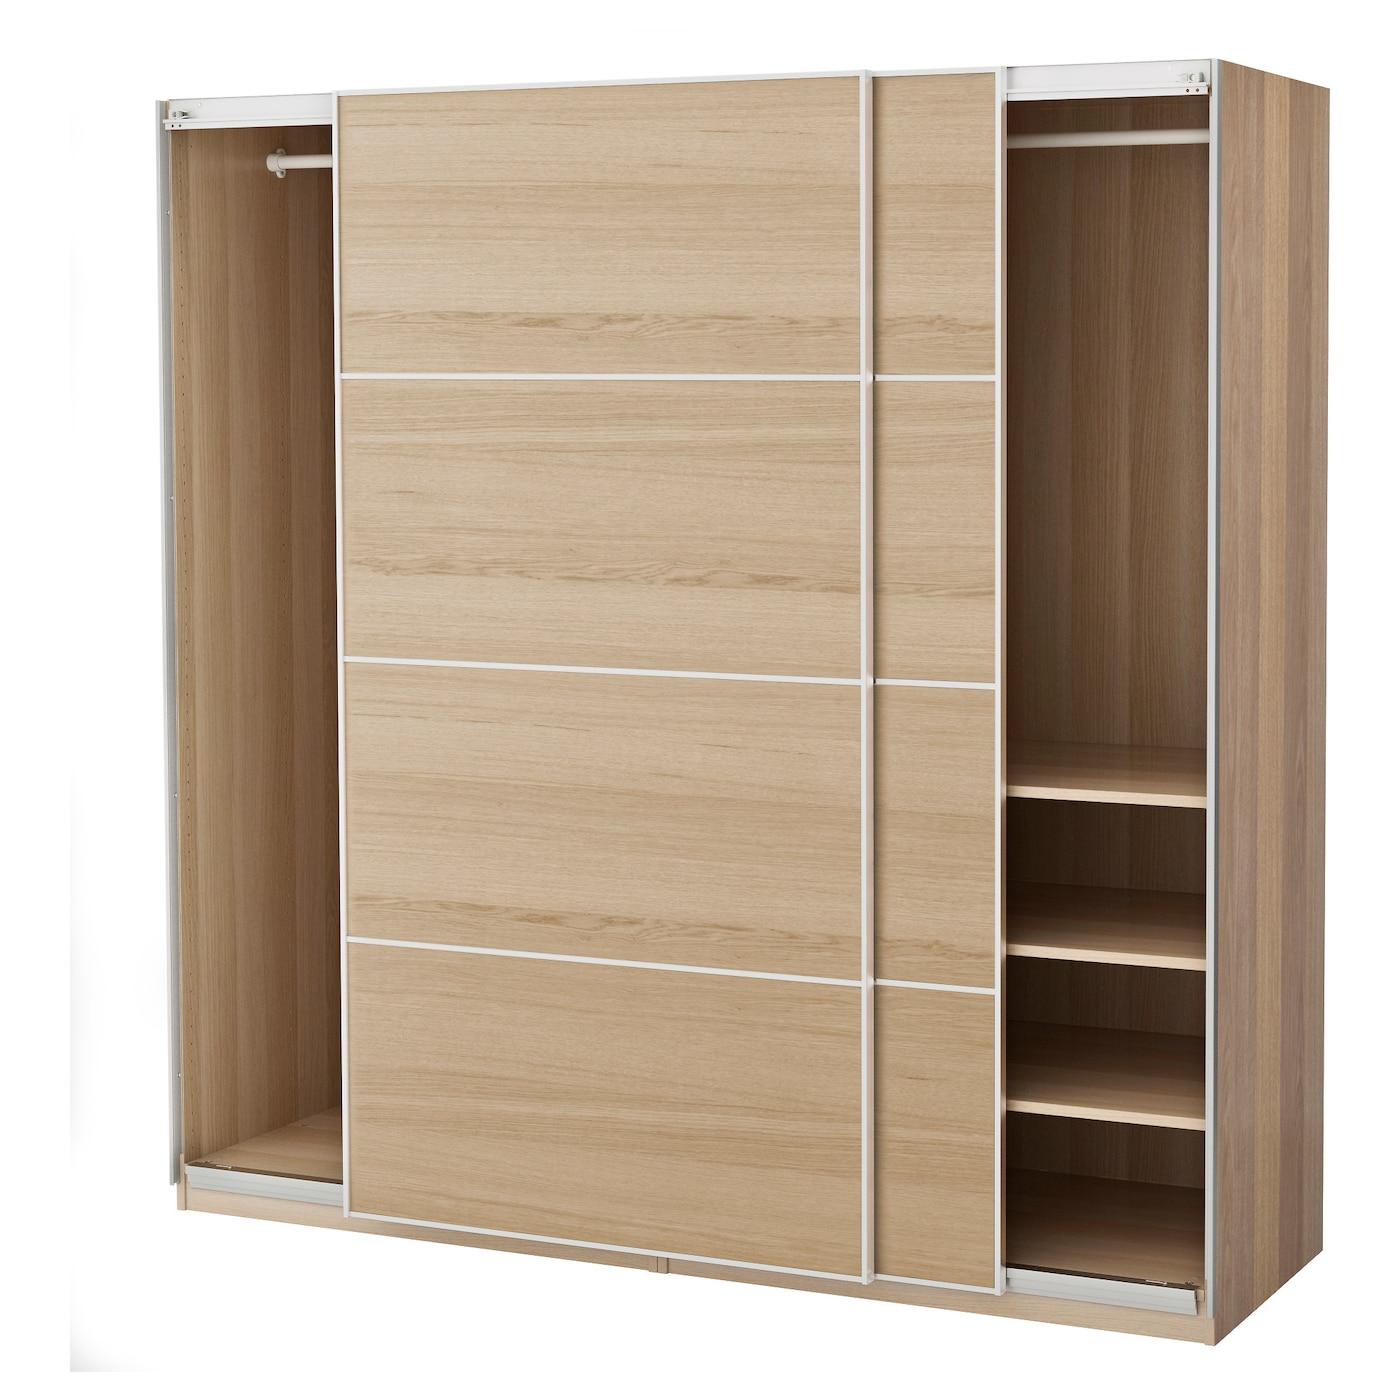 ikea pax wardrobe 10 year guarantee read about the terms in the guarantee brochure - Wardrobe Ikea